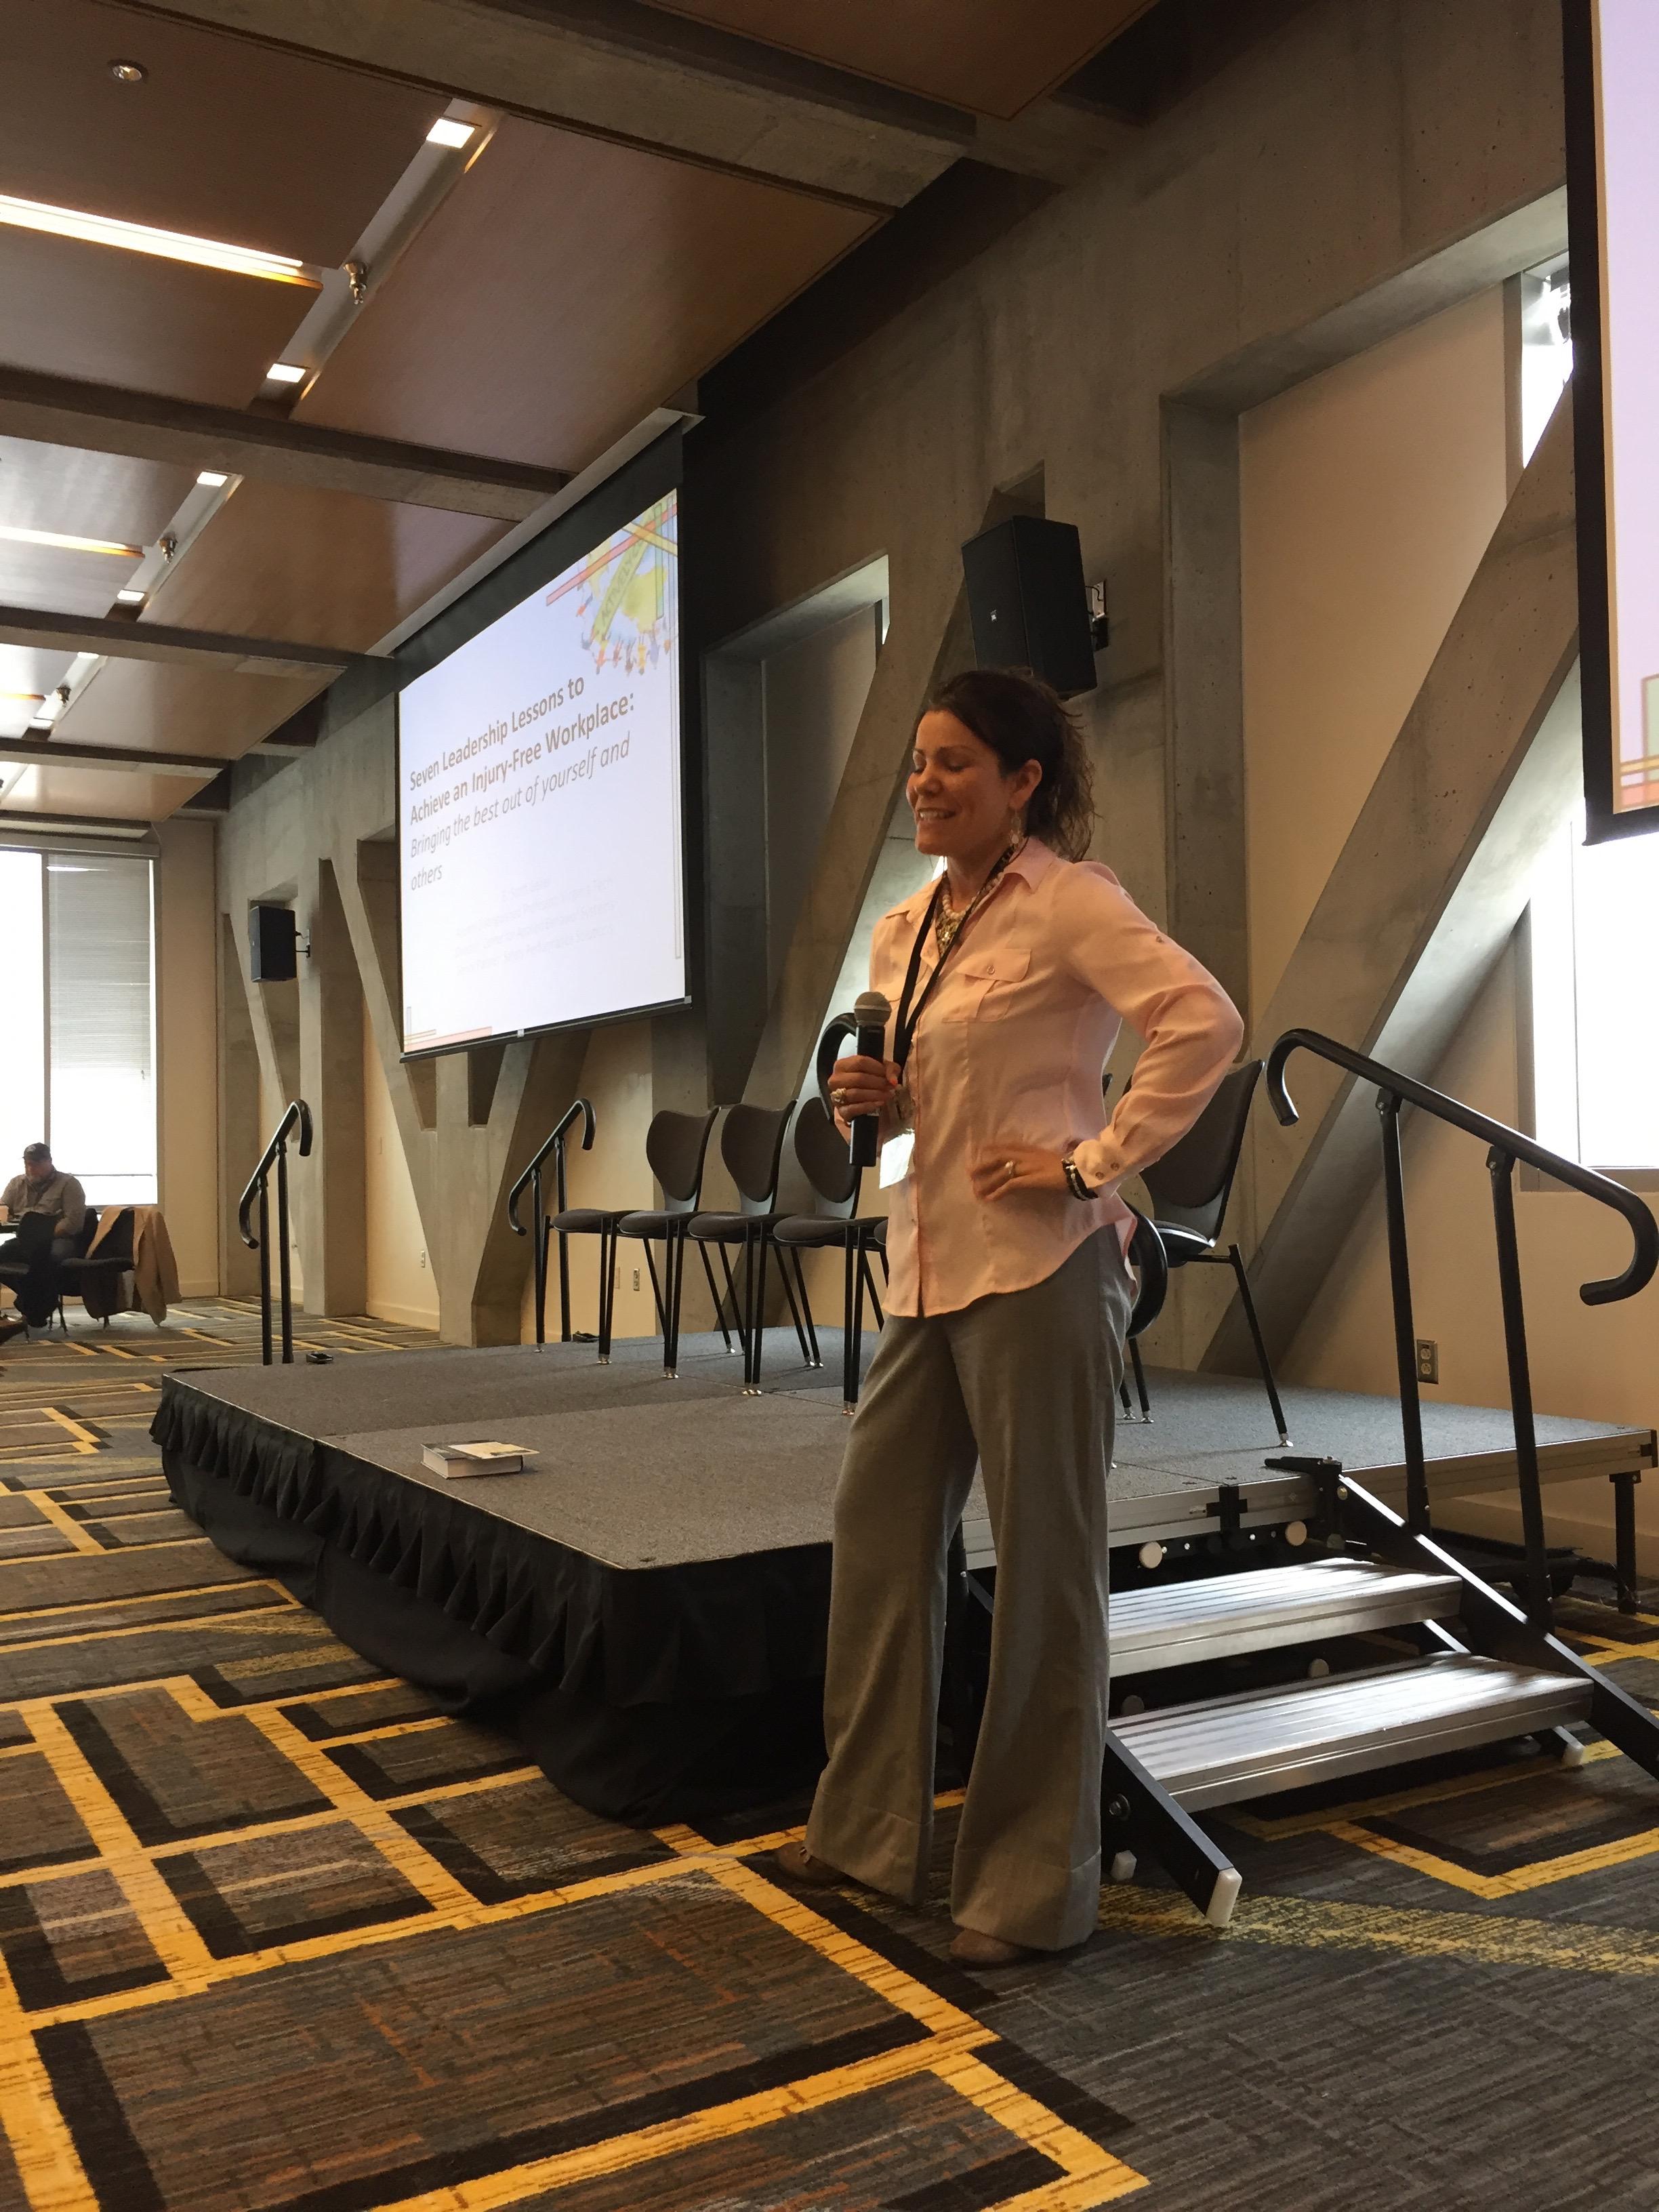 Krista Geller (Bechtel Corporation) conducting a break-out session.